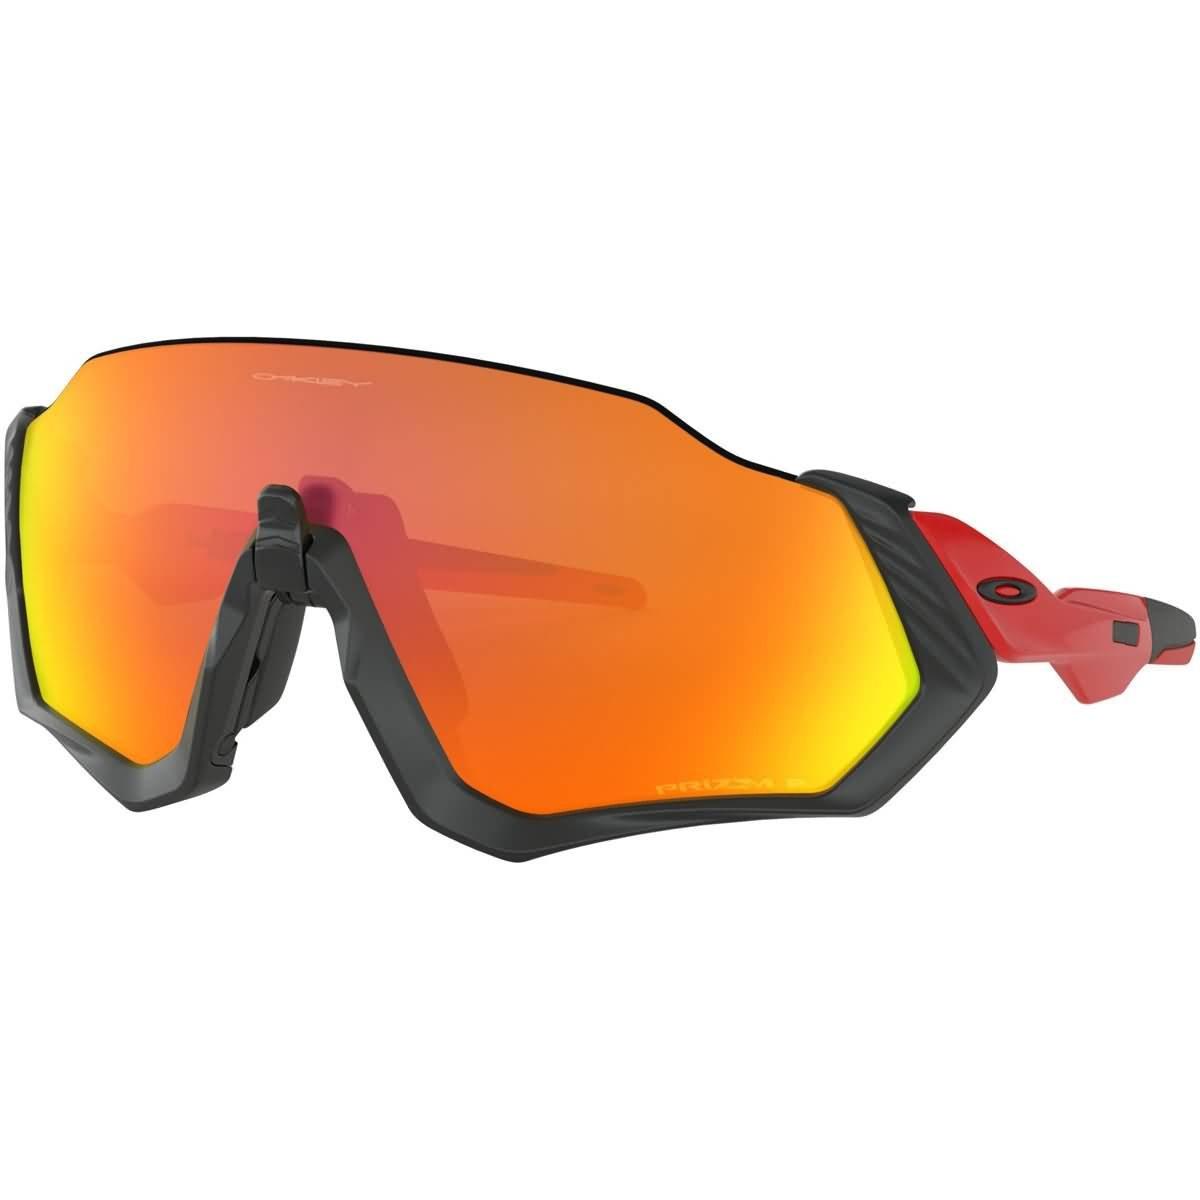 6bec88d012edc Amazon.com  Oakley Men s Flight Jacket Polarized Iridium Rectangular  Sunglasses